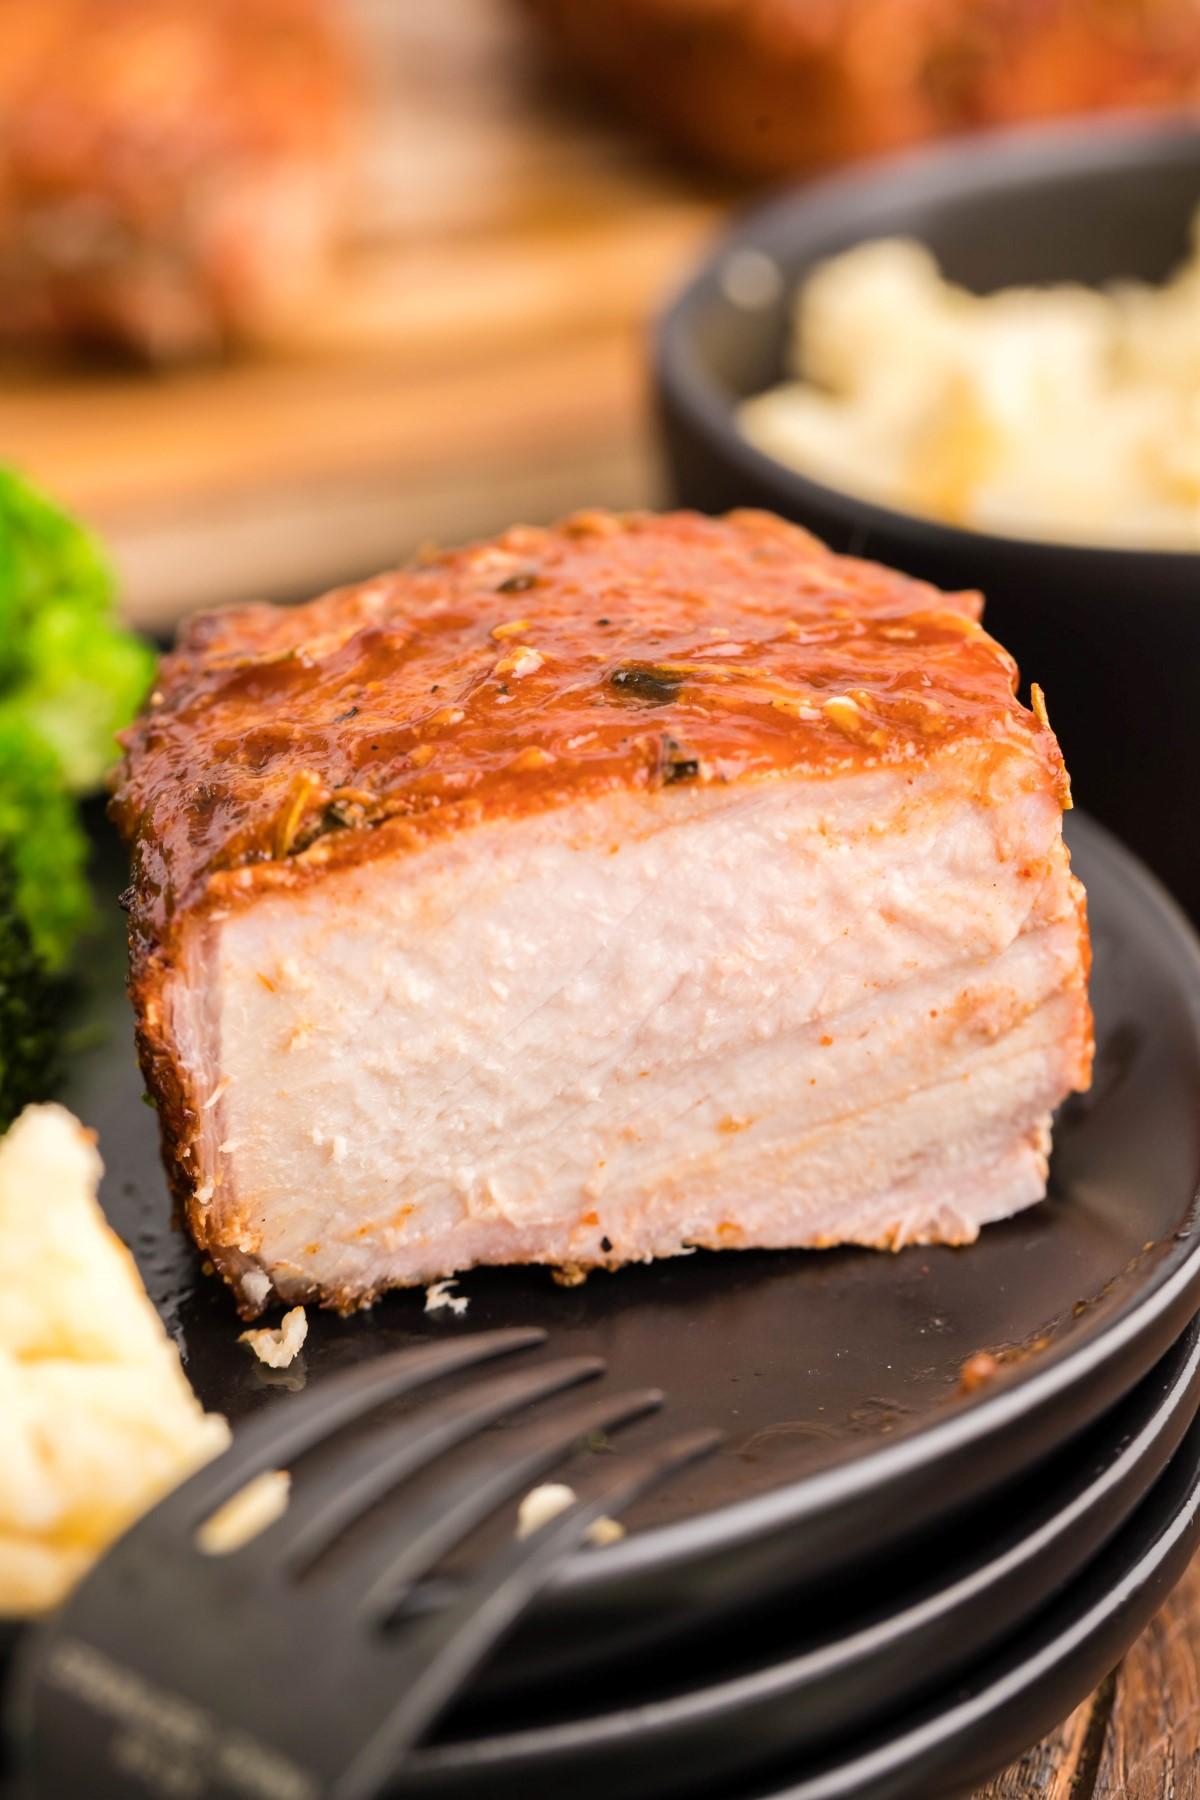 Smoked pork chop cut in half on a black plate.